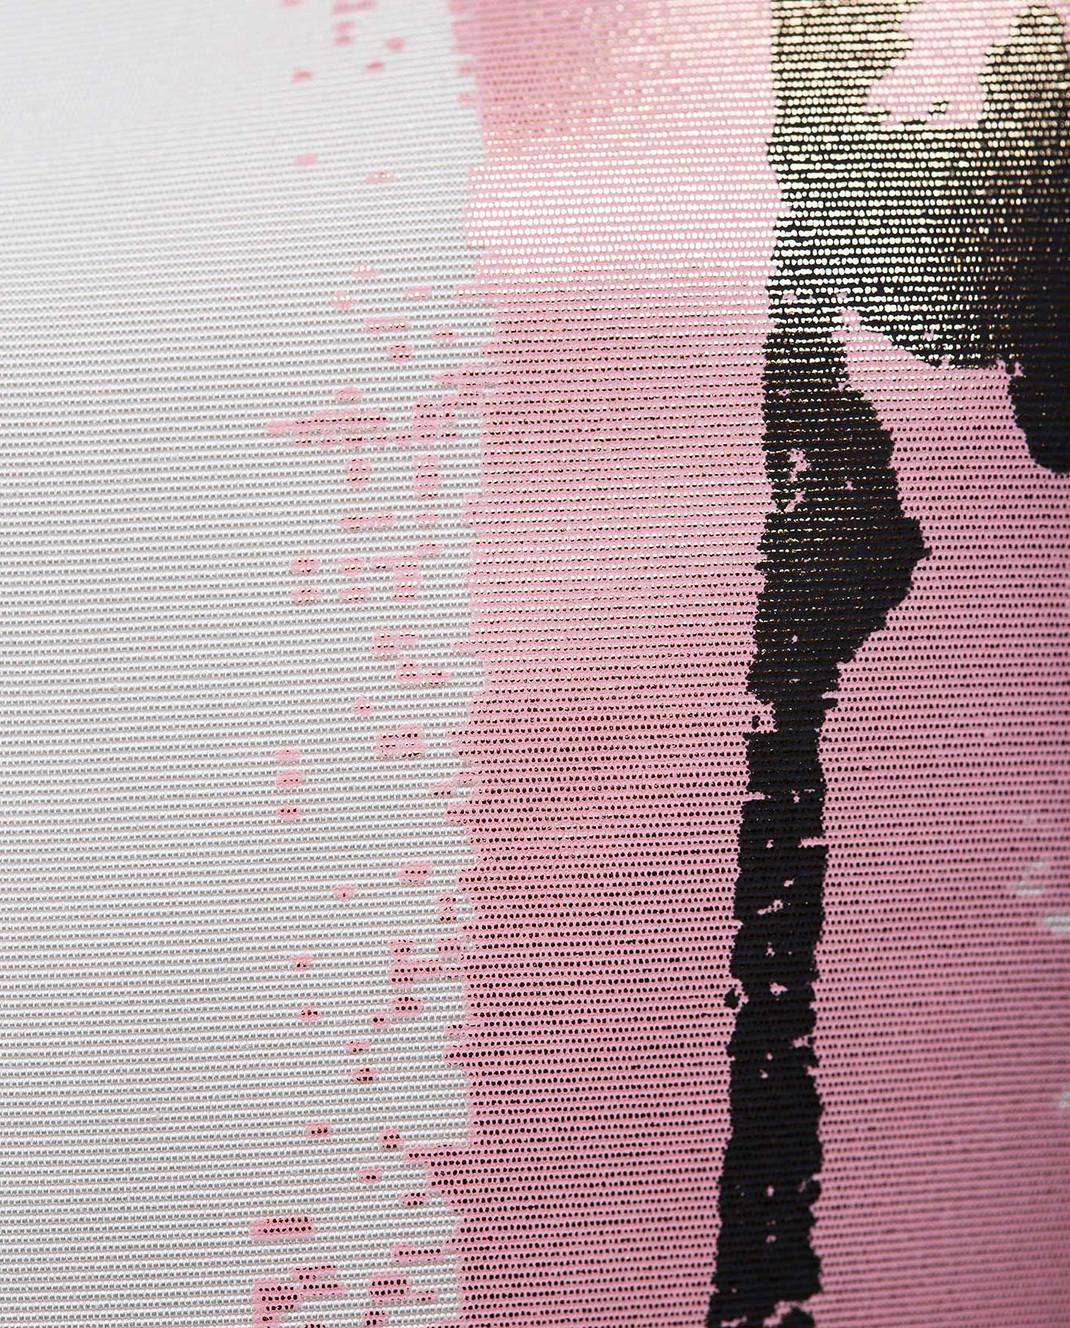 Reed Krakoff Топ из шелка изображение 5